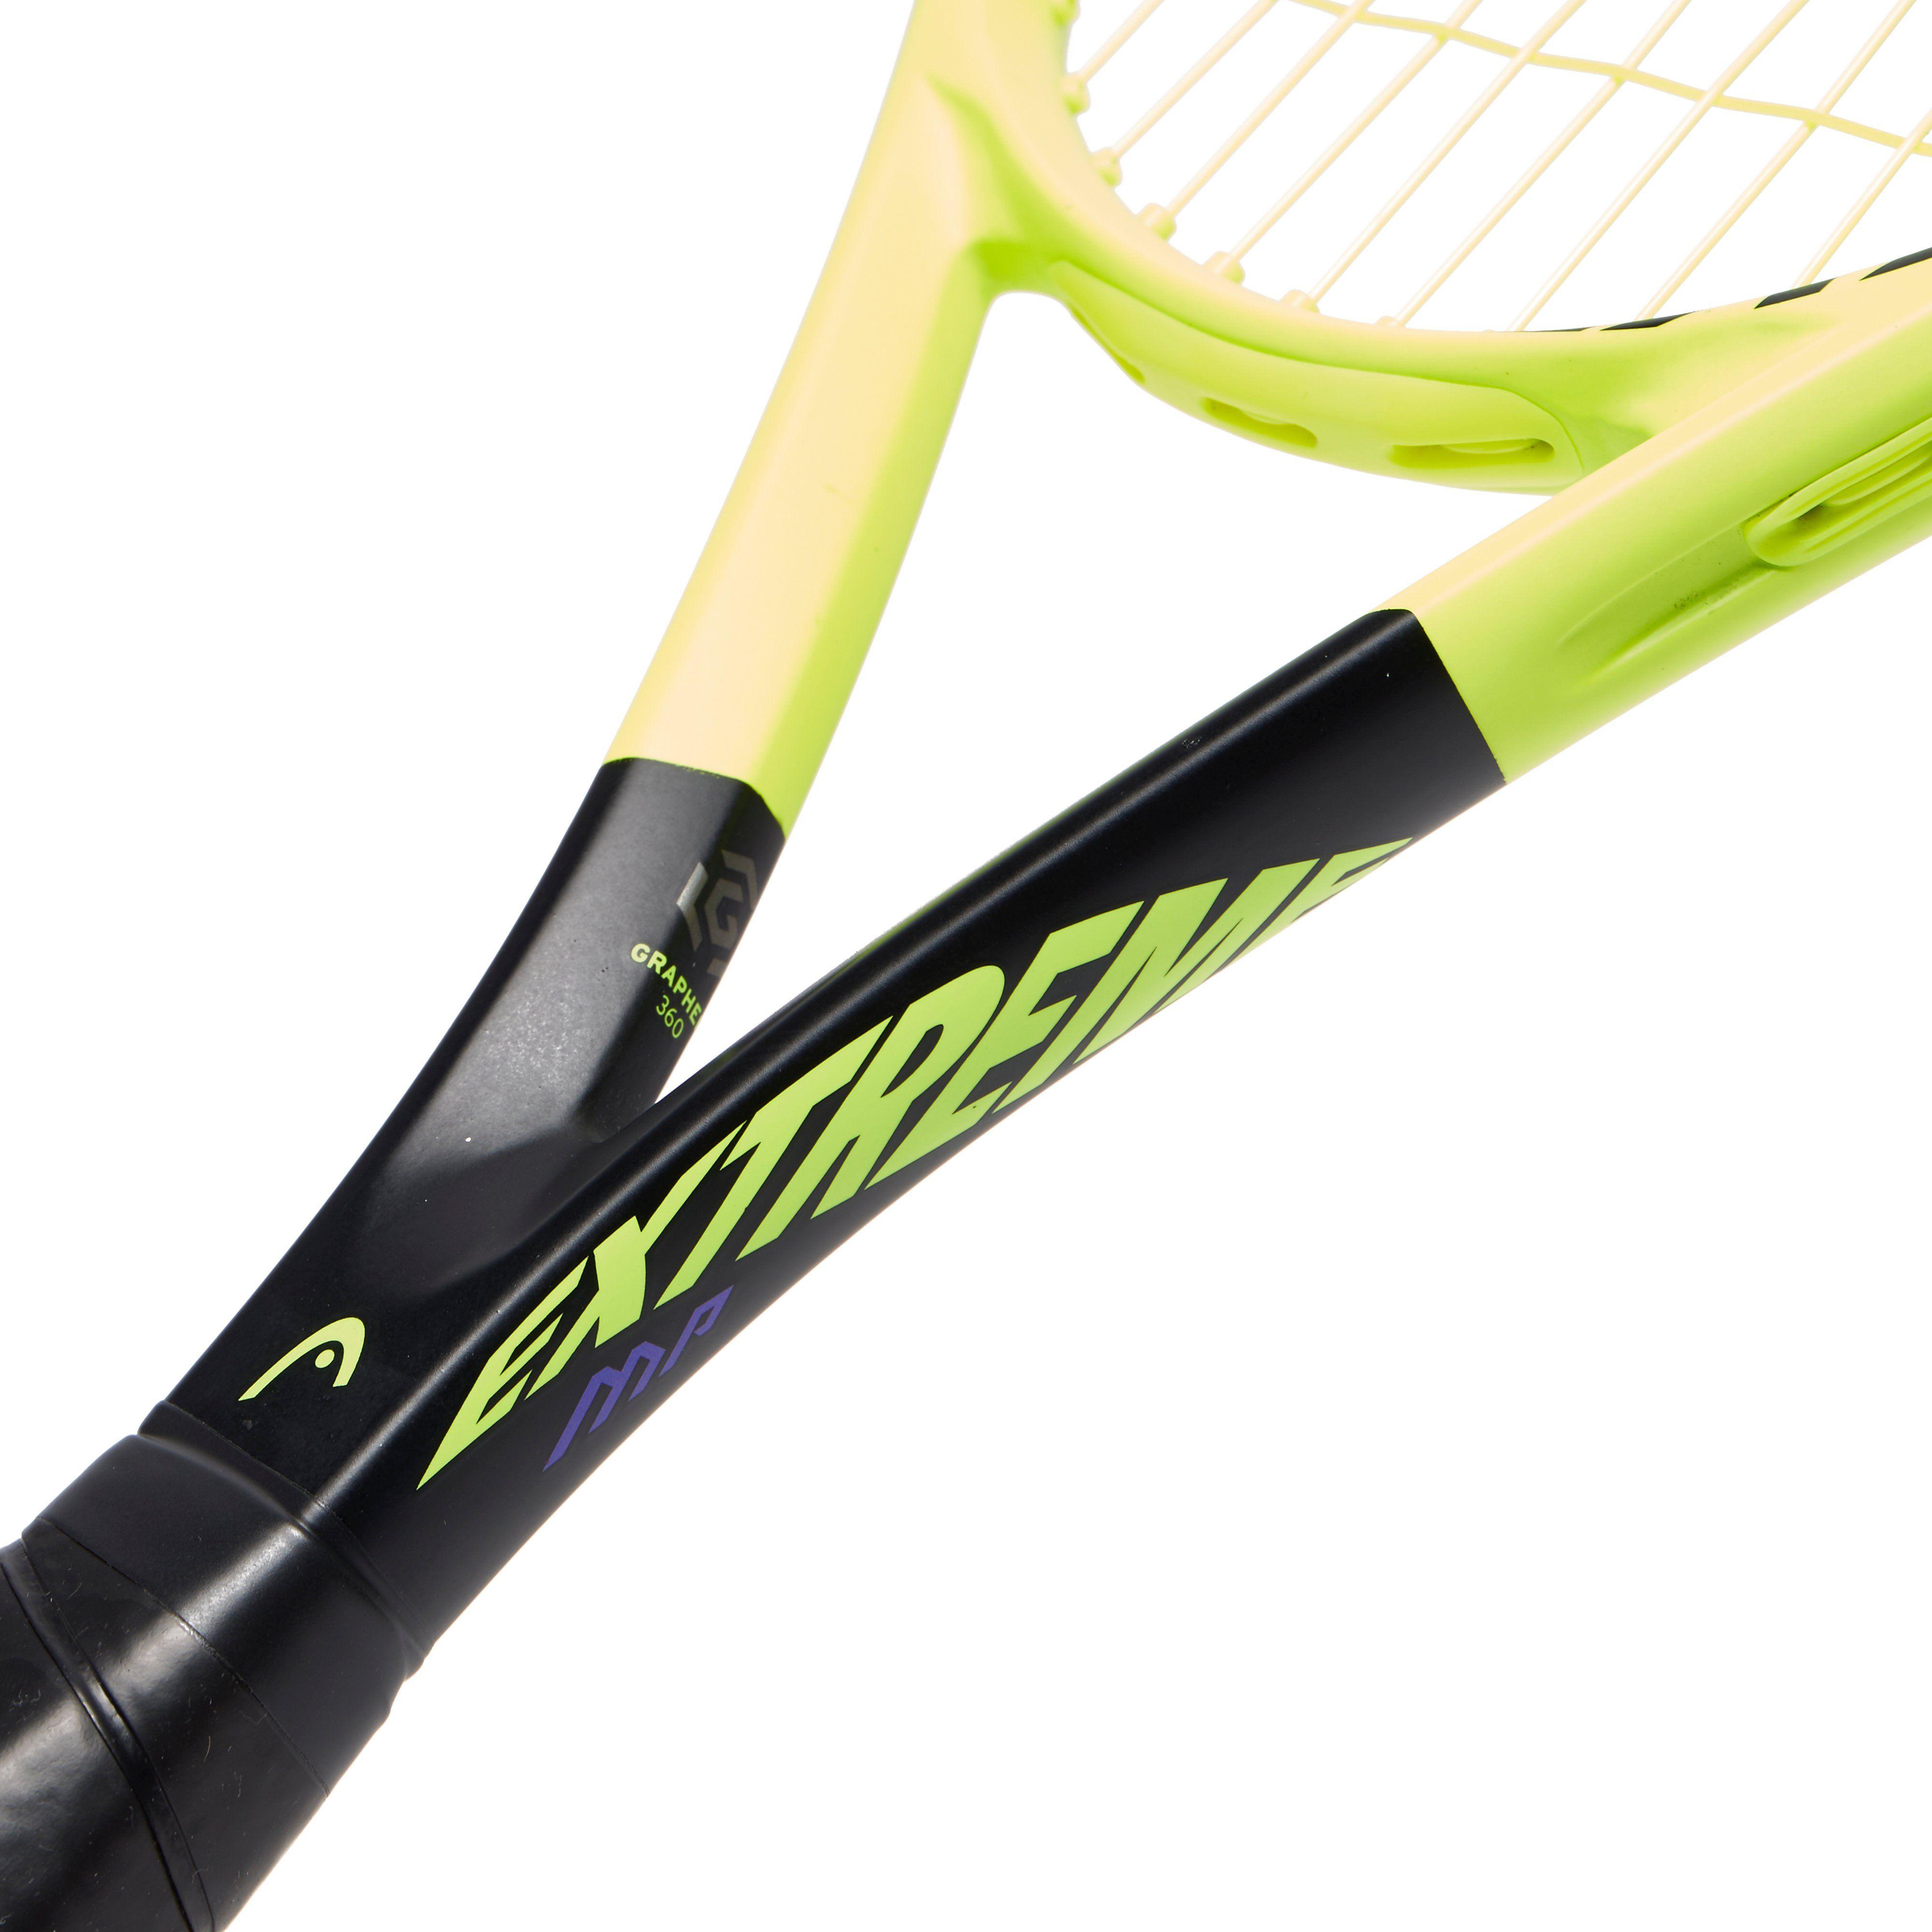 Head Graphene 360 Extreme MP Tennis Racket